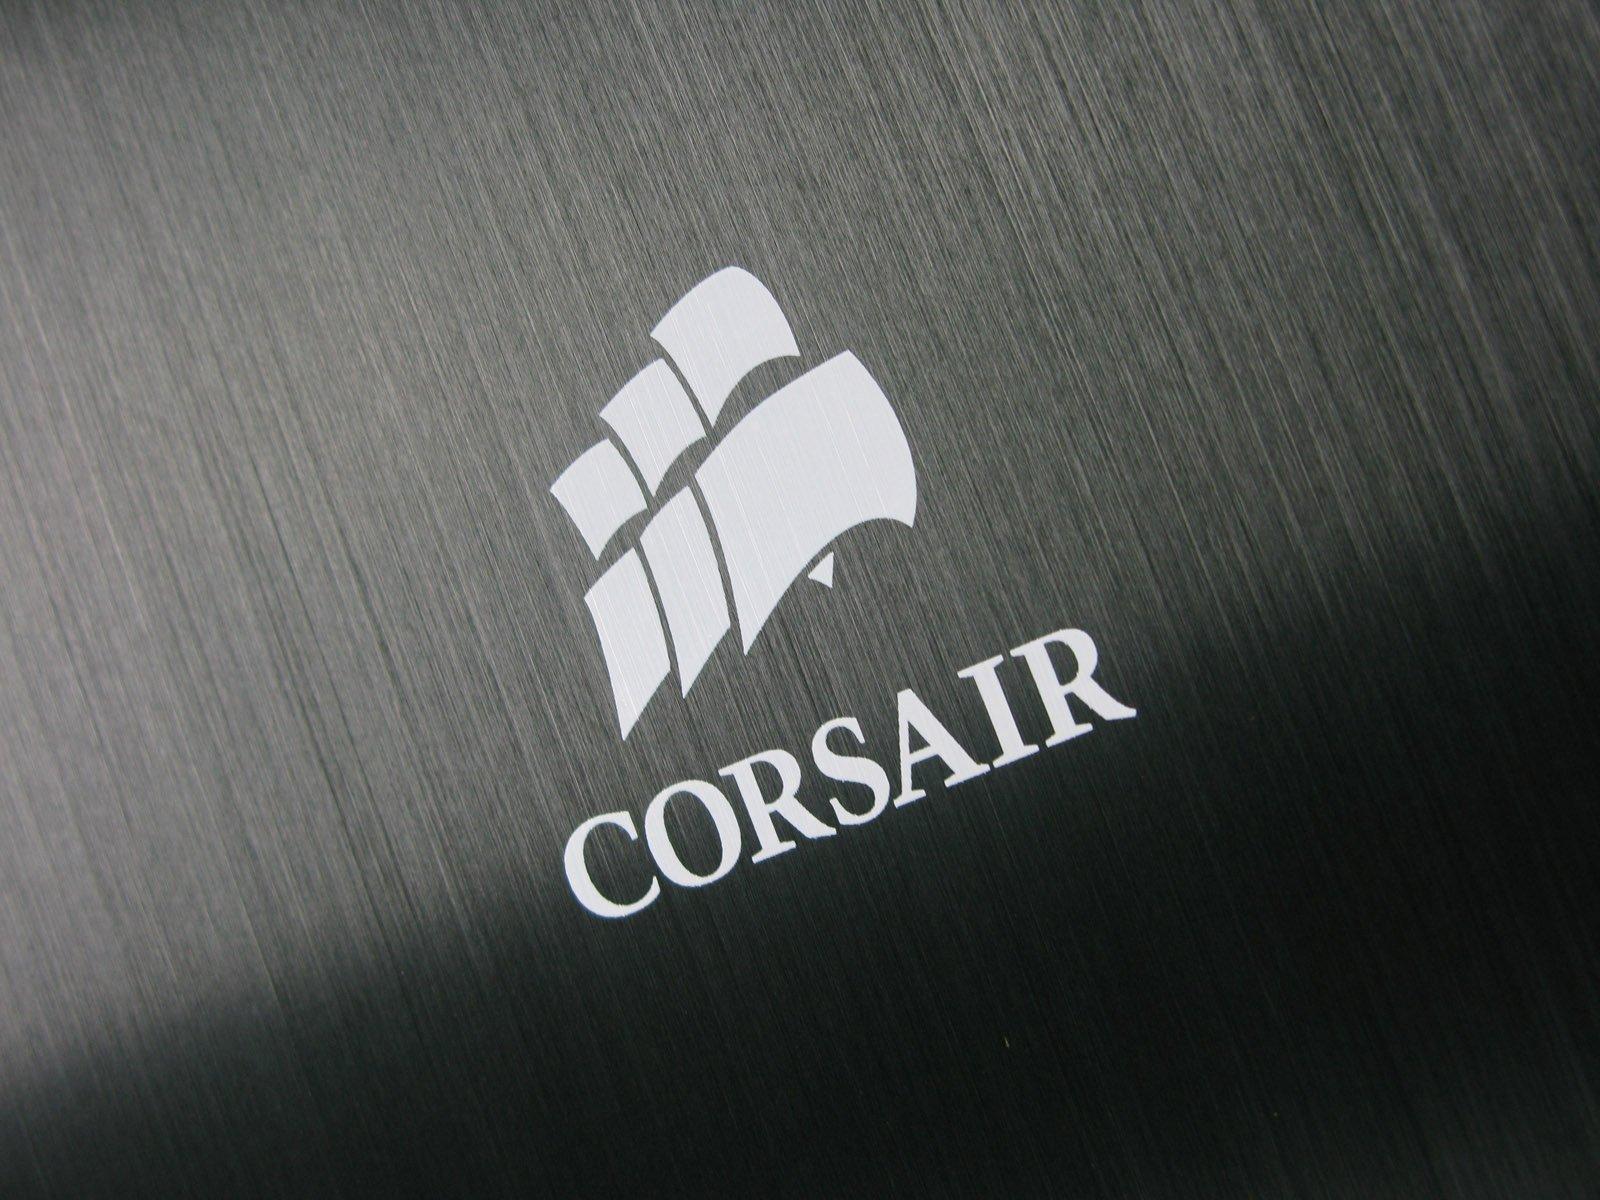 Corsair Wallpaper: CORSAIR Gaming Computer Wallpaper